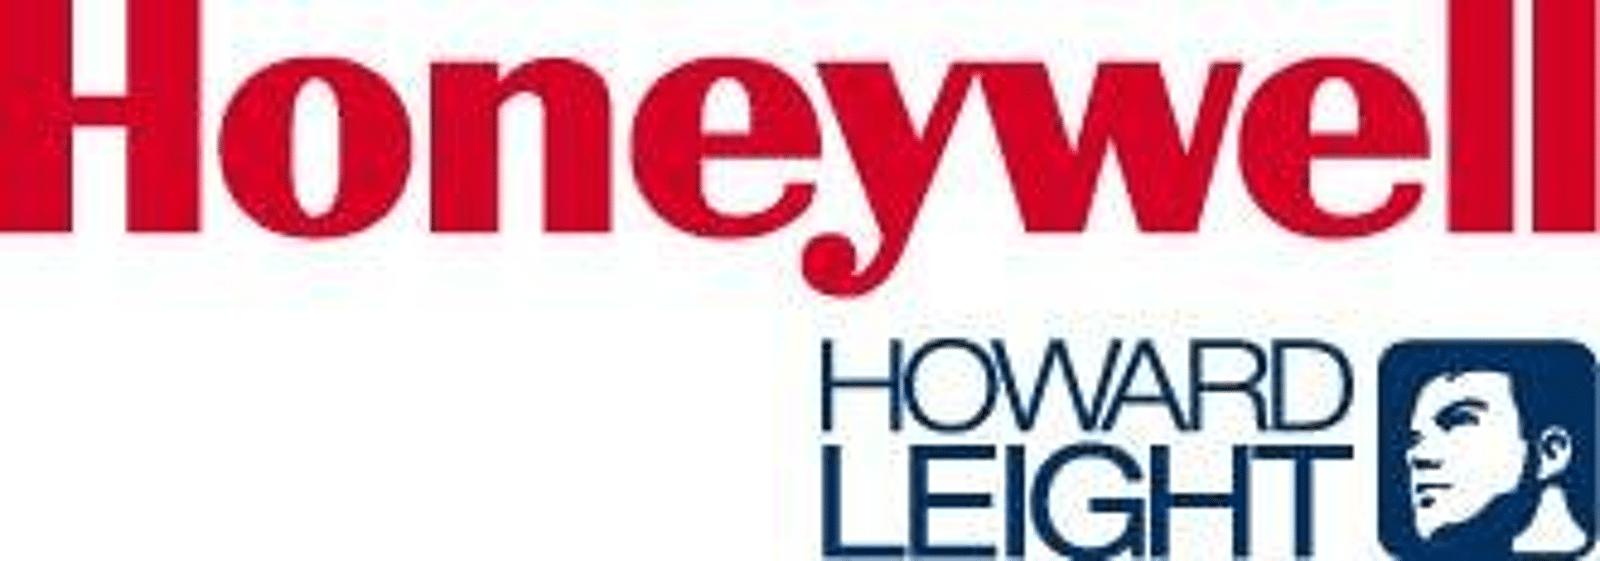 Honeywell Howart Leight